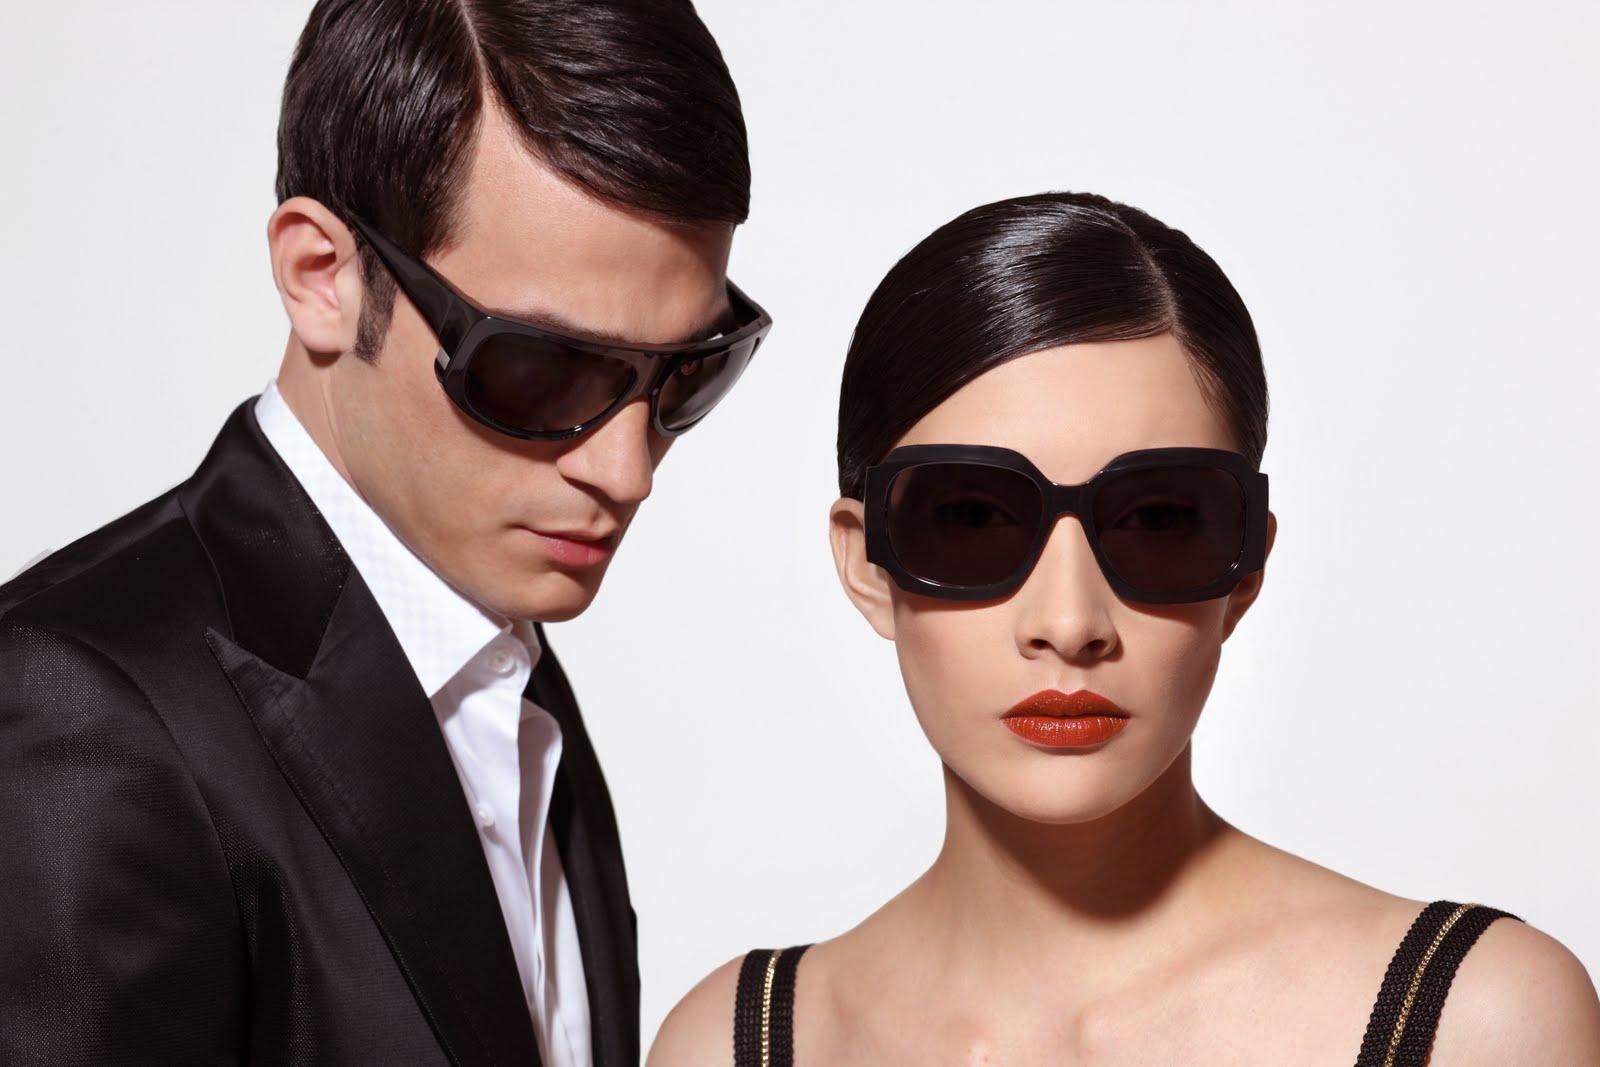 l'ultimo becf0 b620f Scopri gli occhiali da sole migliori